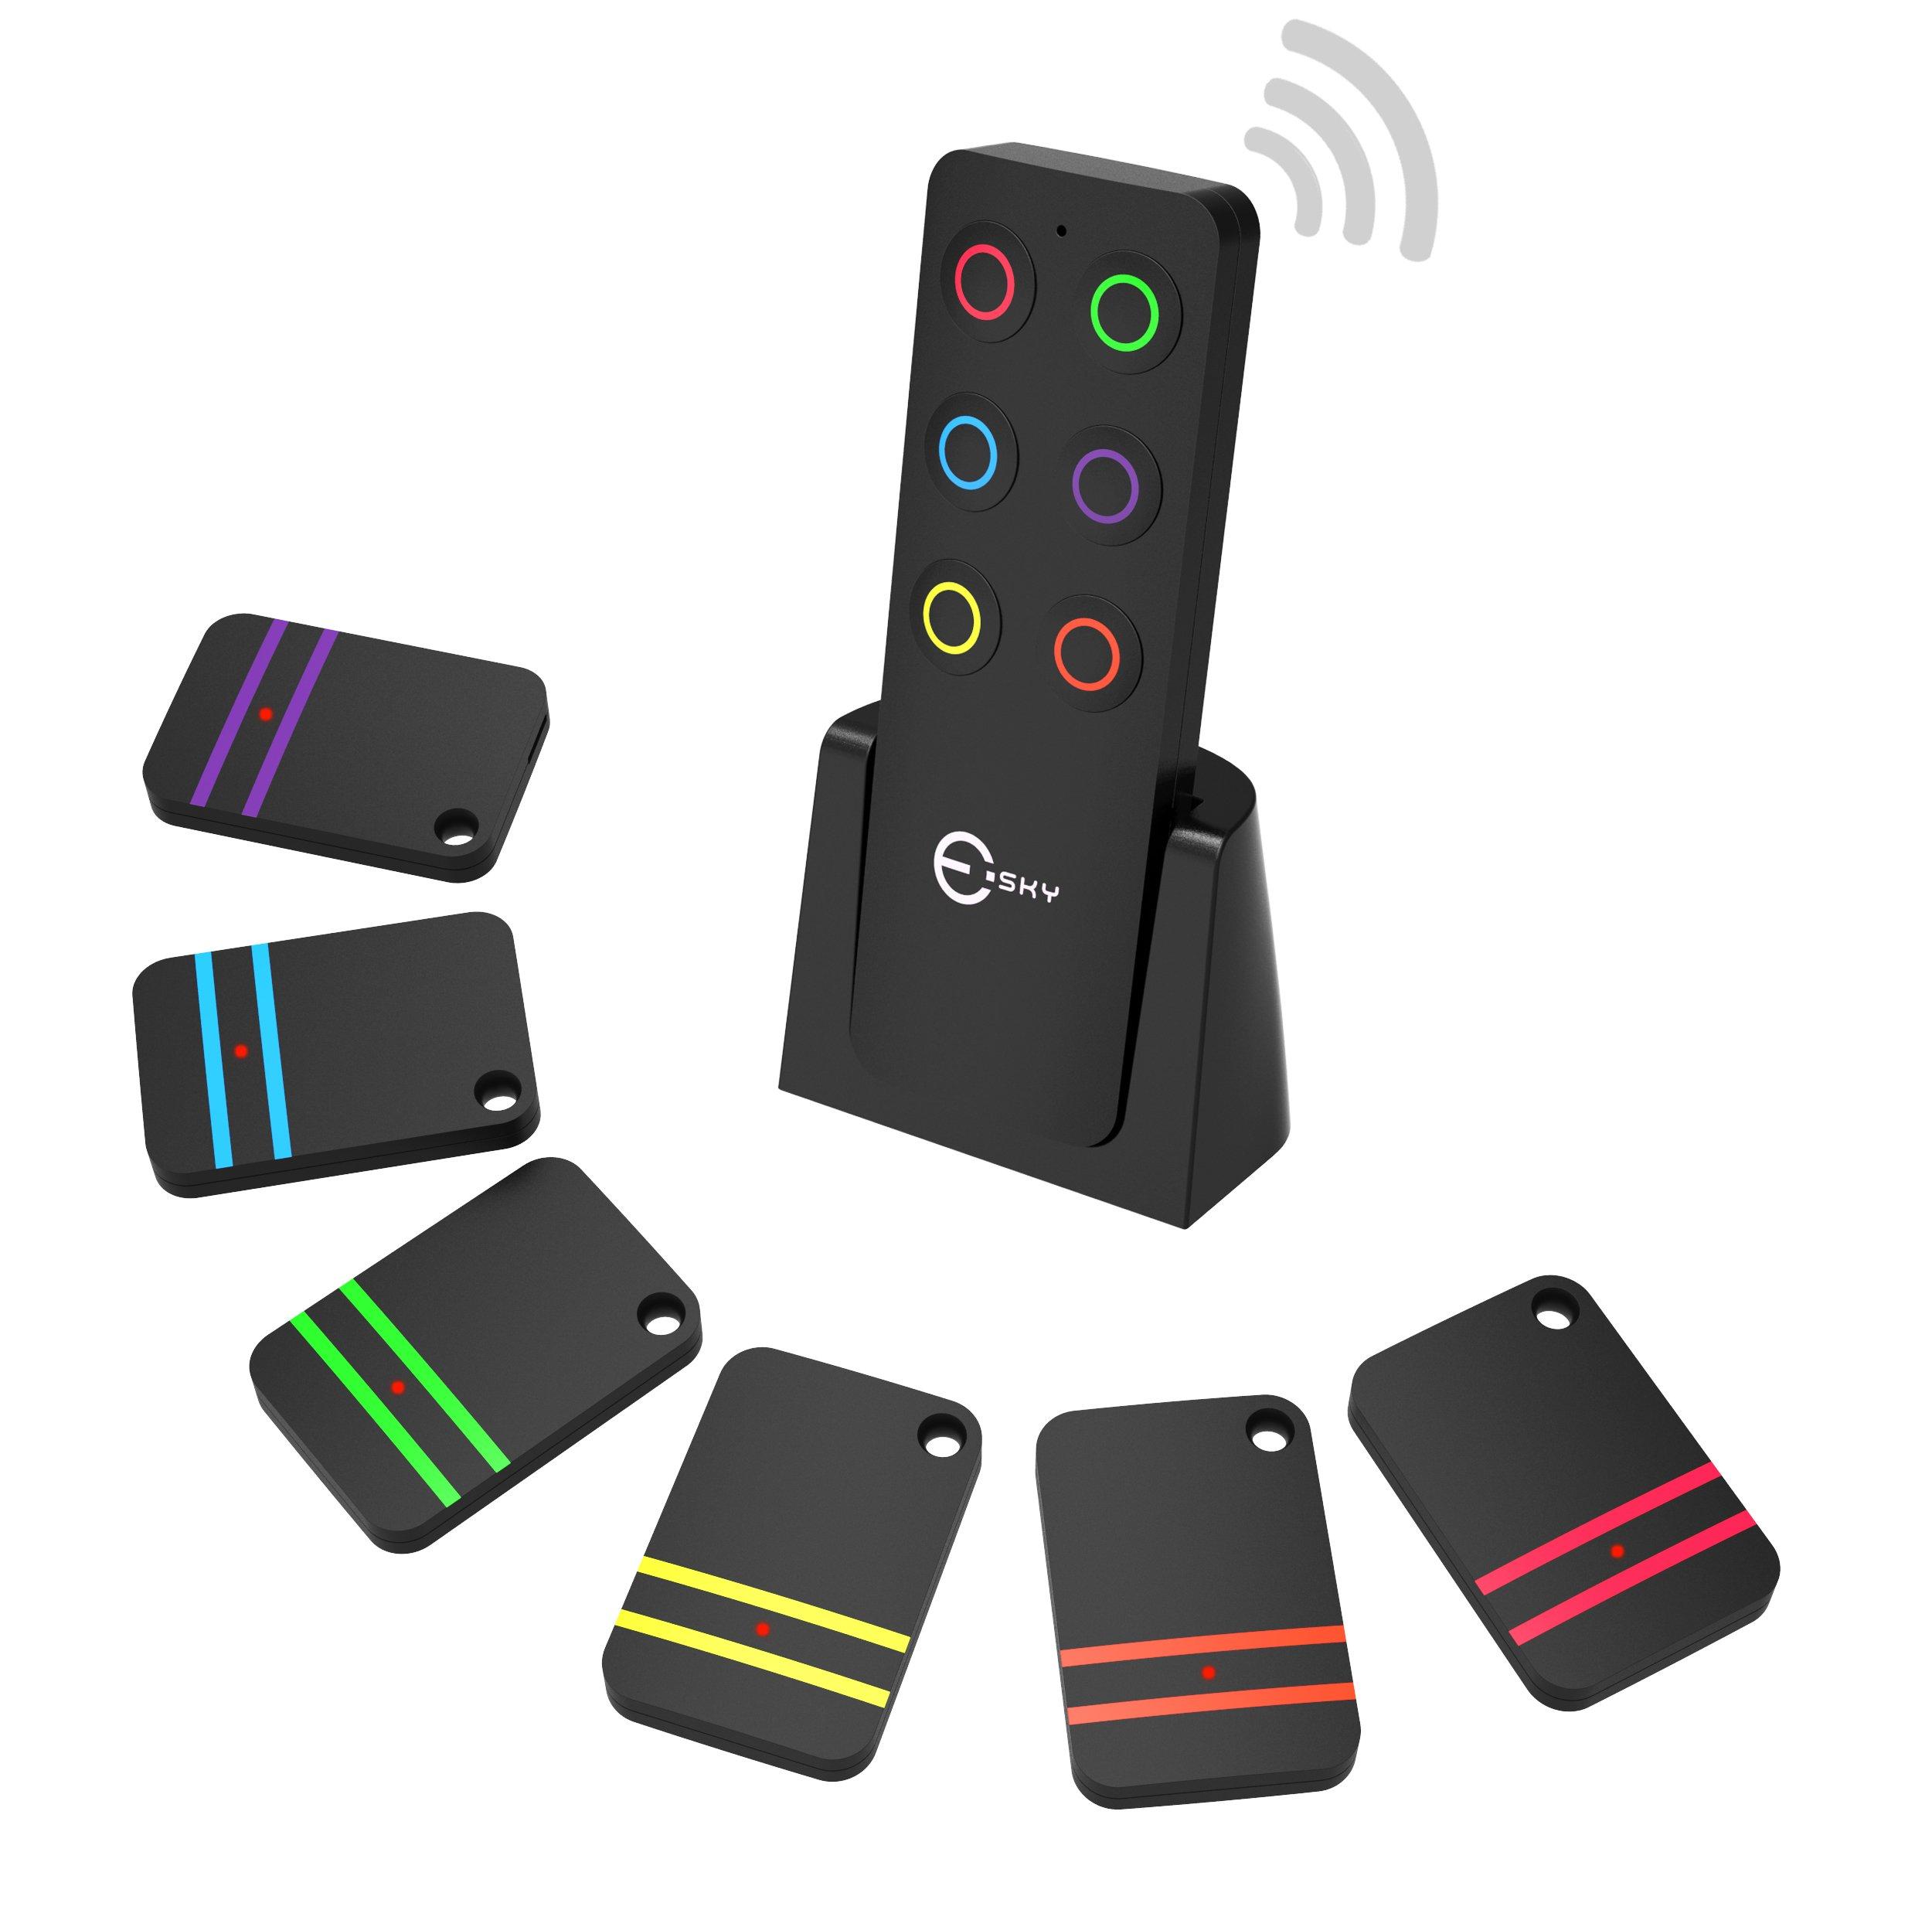 Key Finder, Esky Wireless RF Item Locator Item Tracker Support Remote Control,1 RF Transmitter and 6 Receivers - Wireless Key RF Locator, Pet Tracker Wallet Tracker by Esky